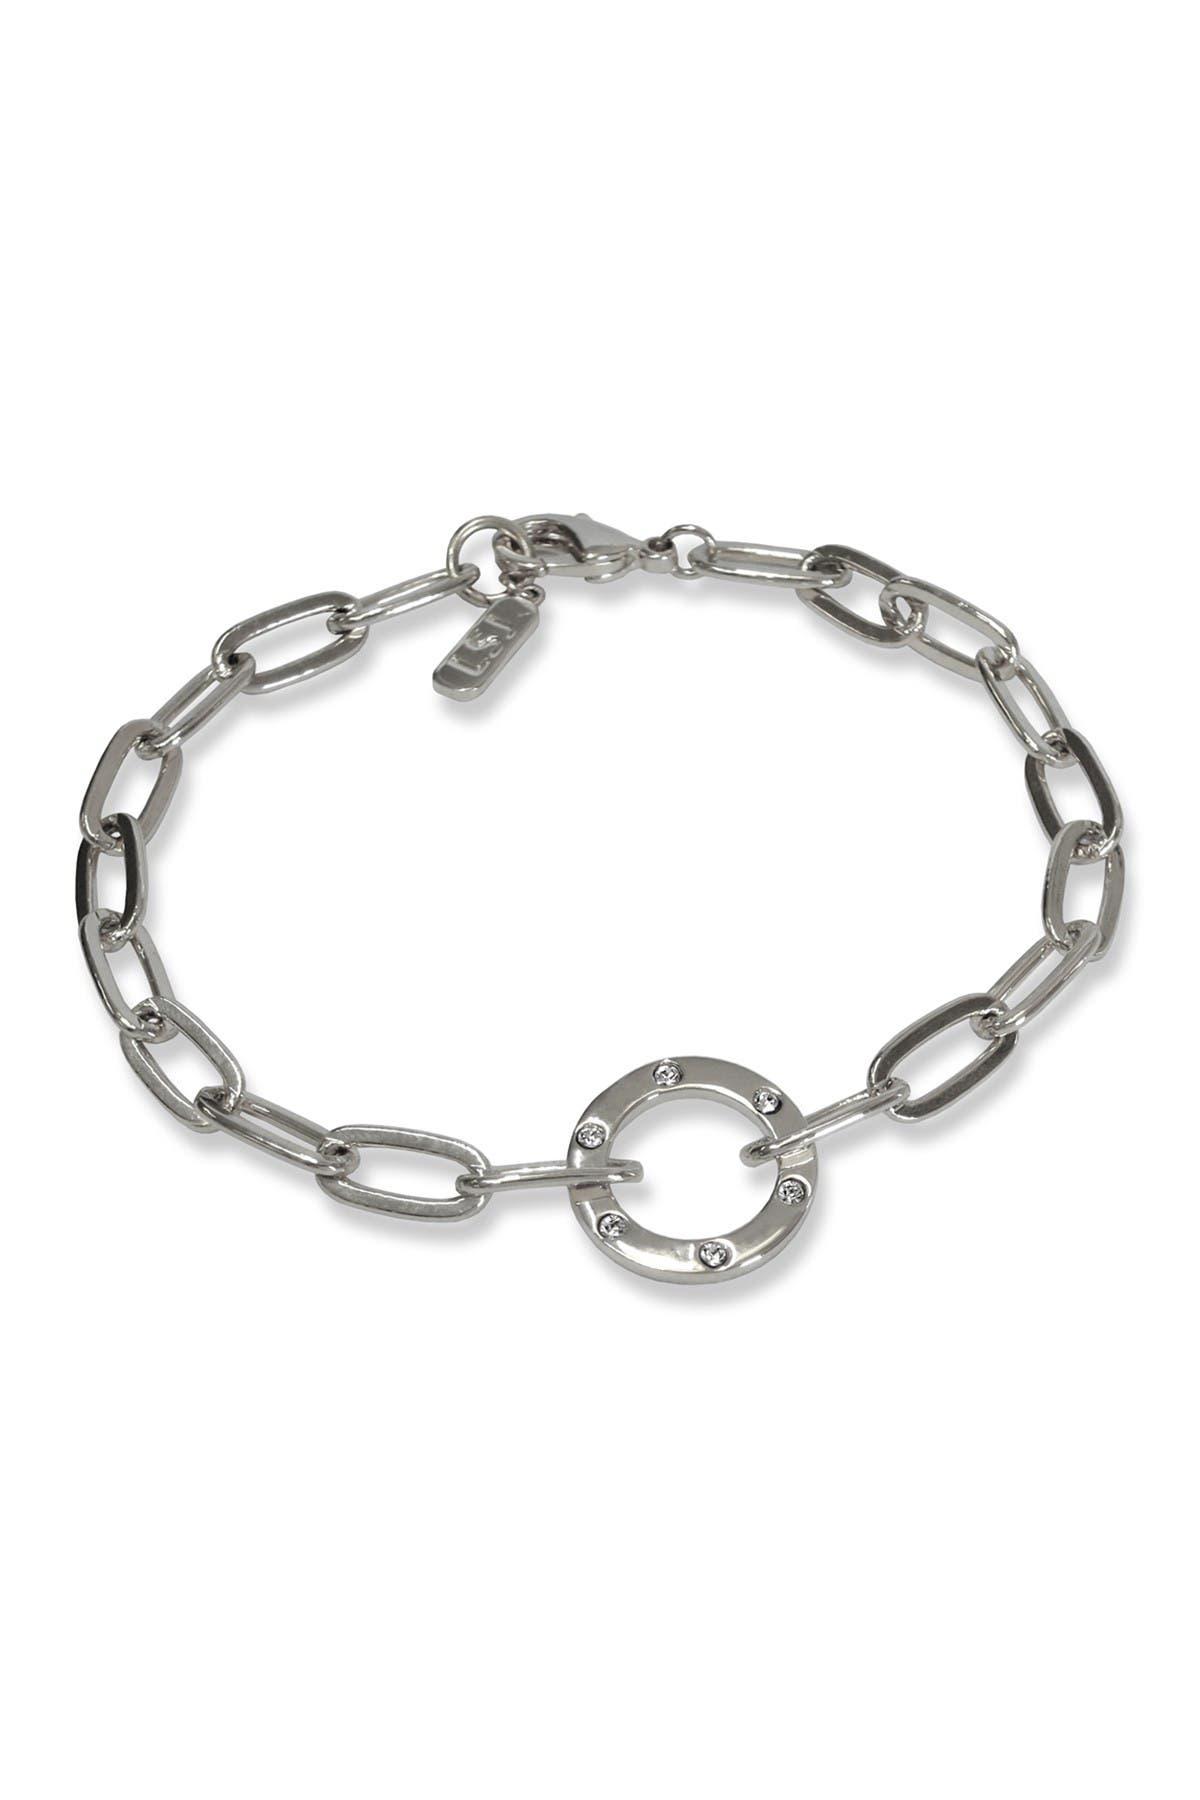 Image of Liza Schwartz Amour Circle Chain Bracelet